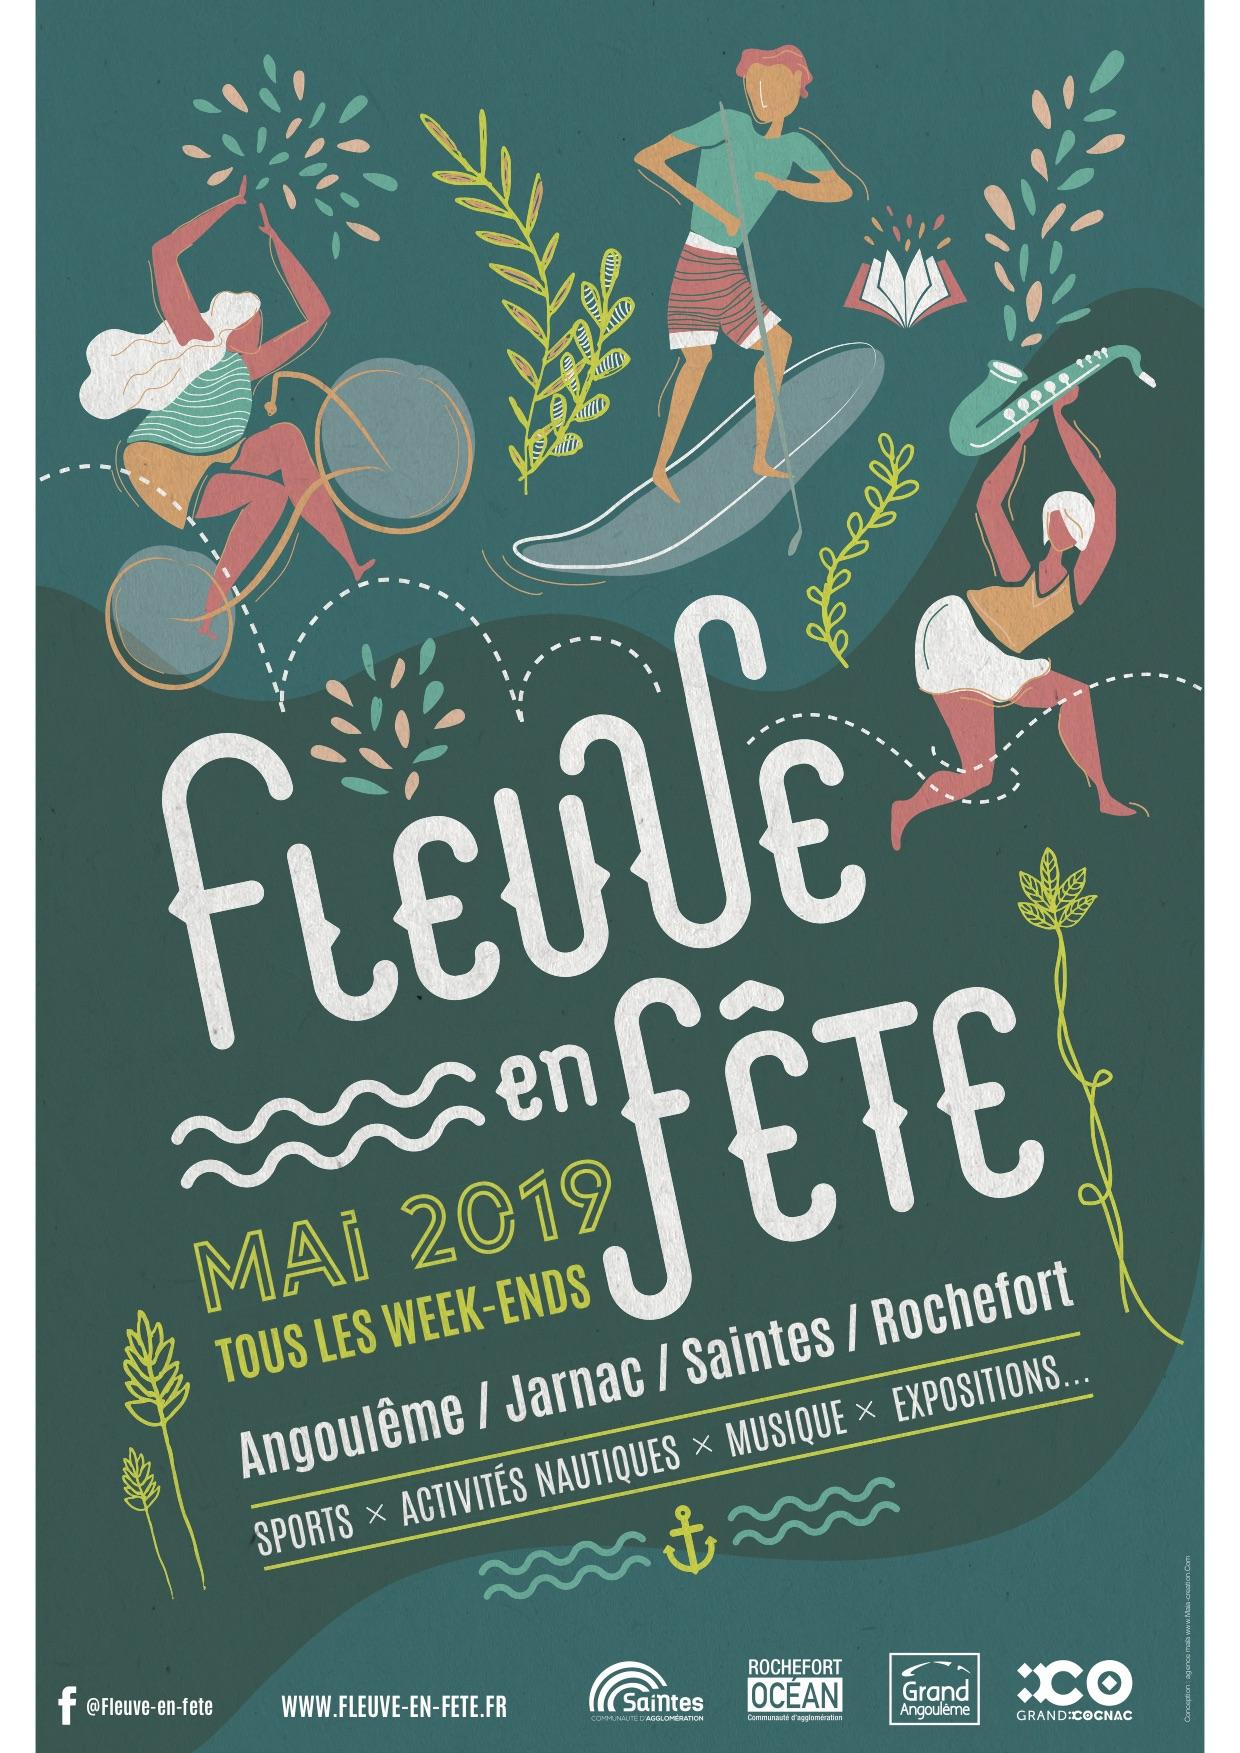 2019 Fête du fleuve Affiche.jpg